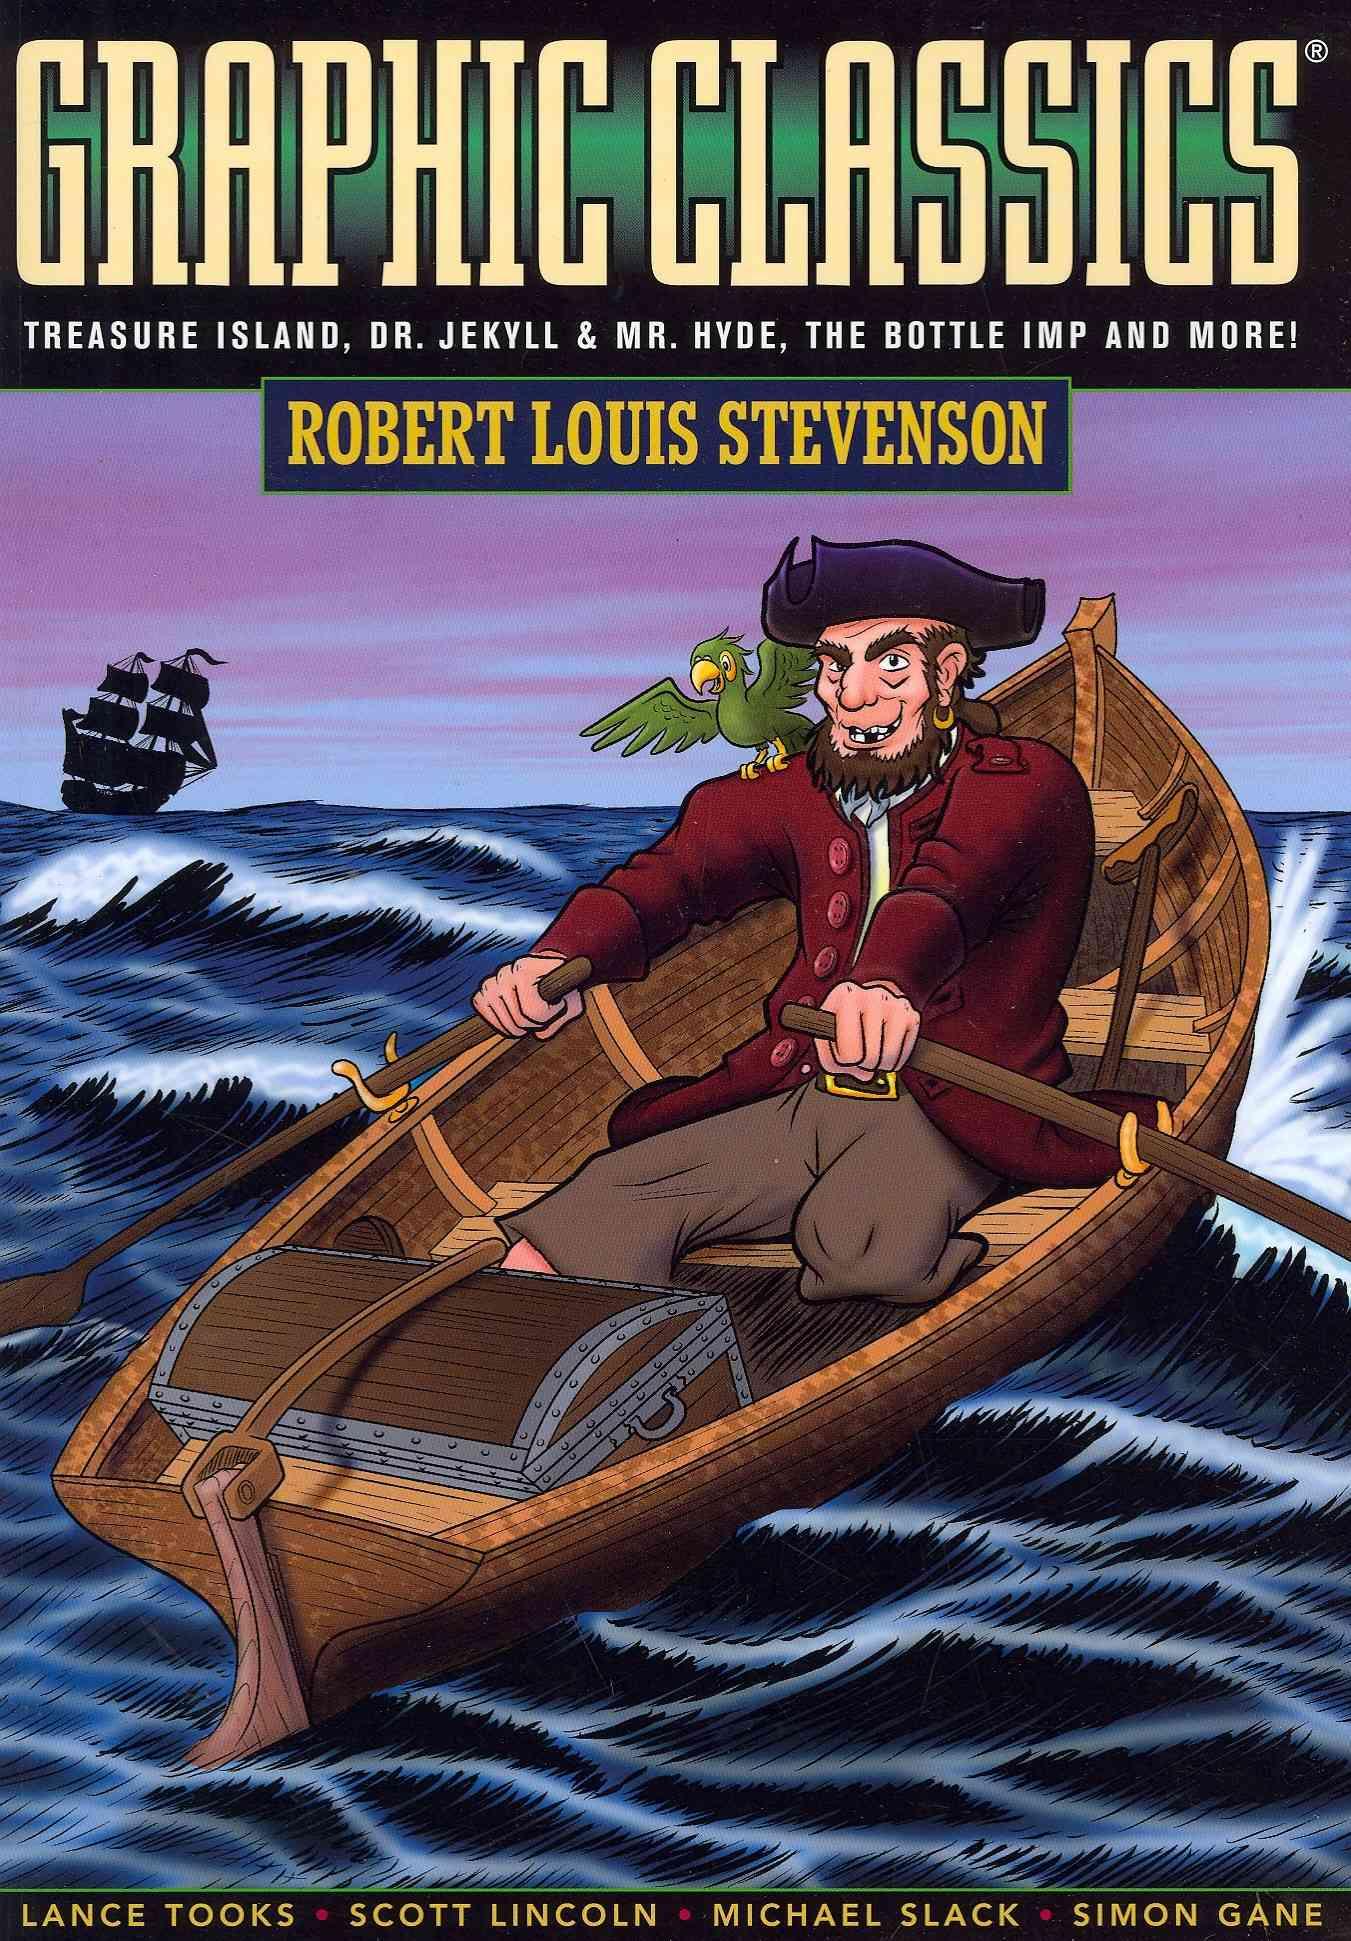 Graphic Classics Robert Louis Stevenson (Paperback)